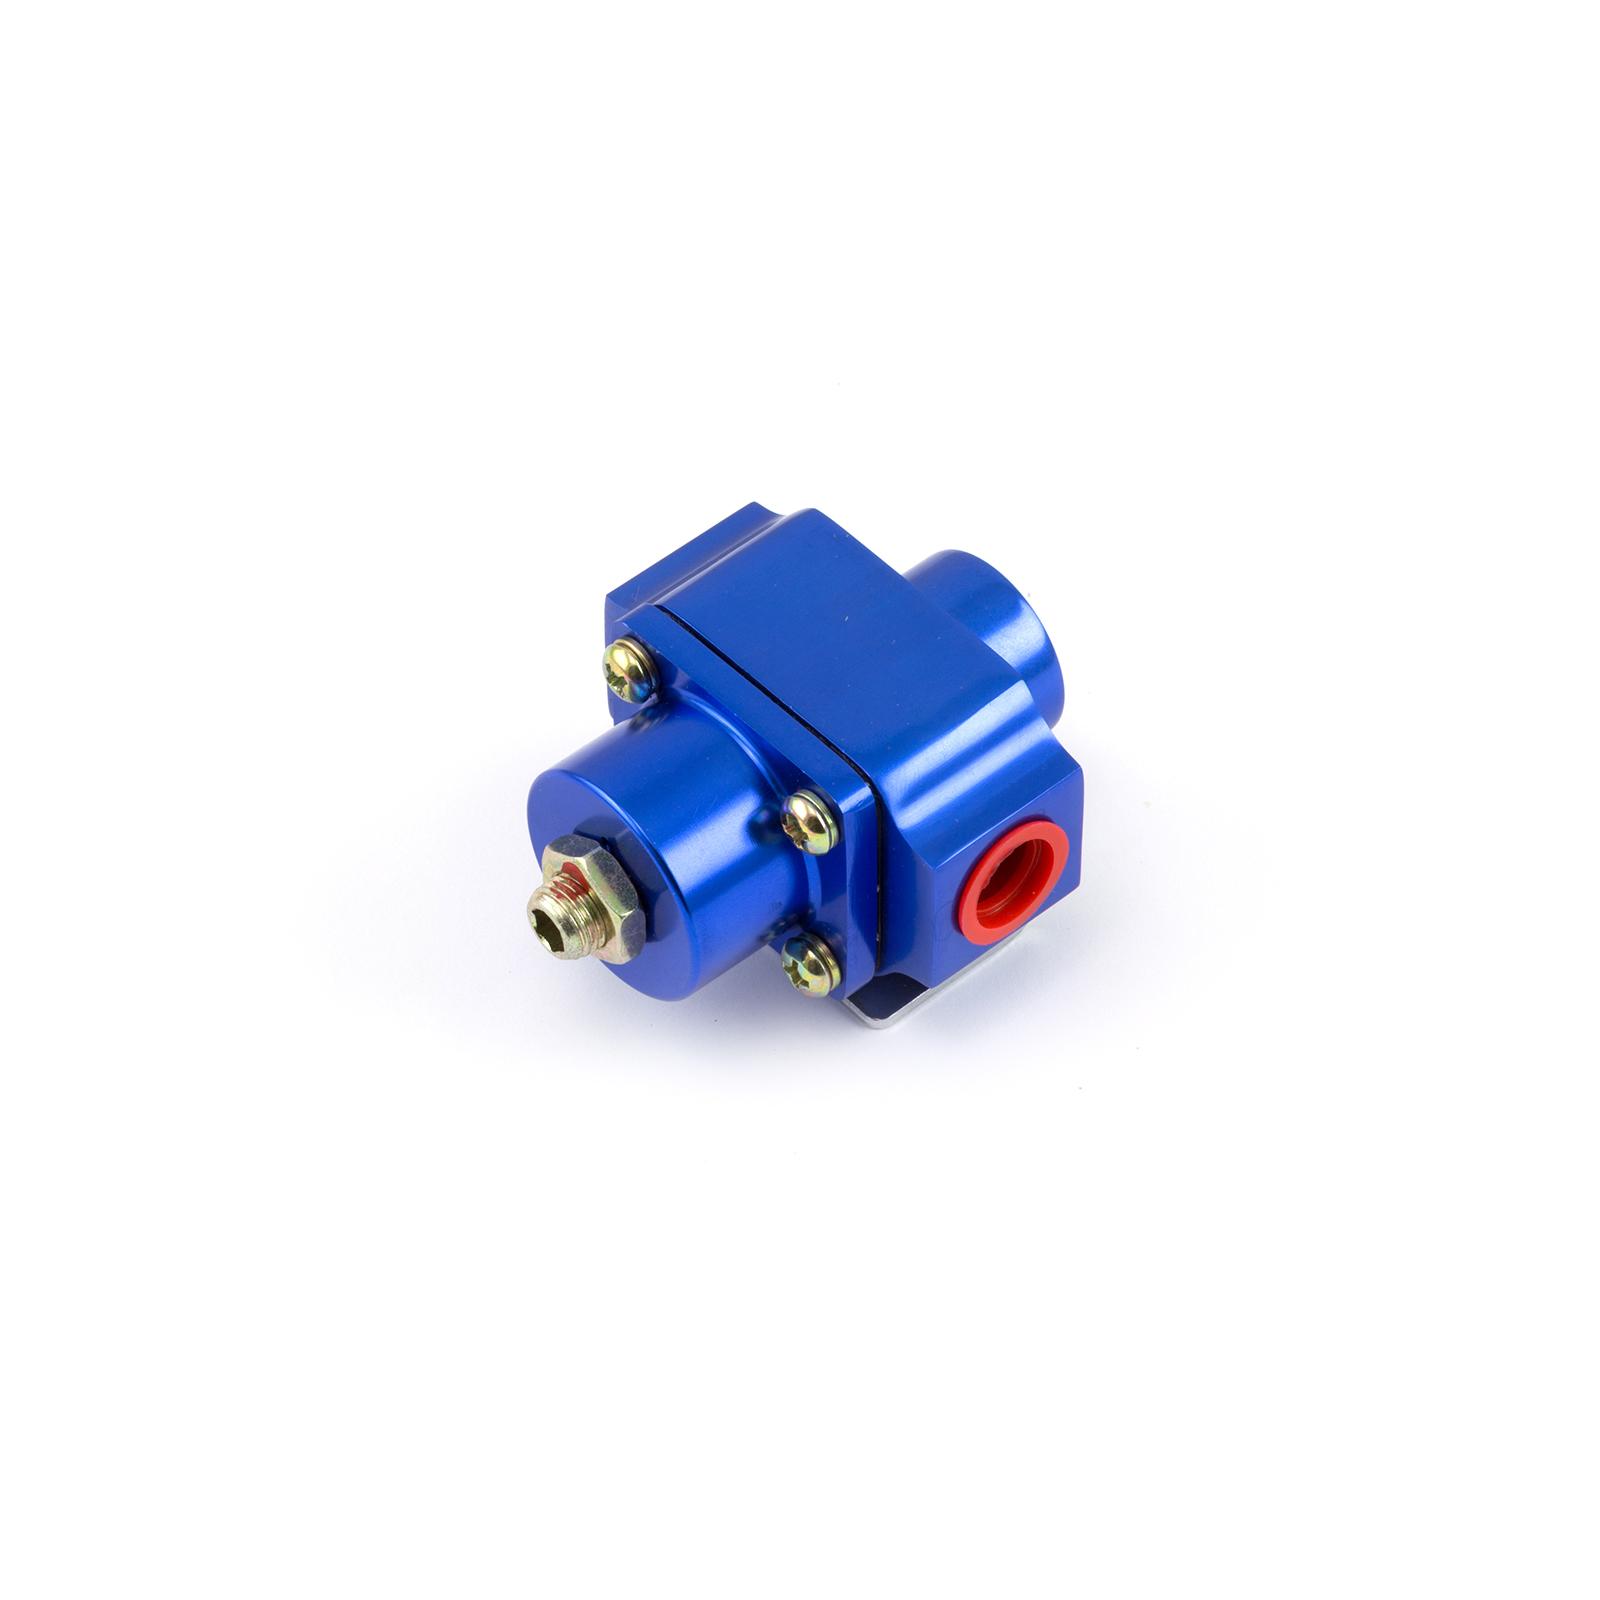 3-12 psi Adjustable Universal Deadhead Fuel Pressure Billet Regulator Blue